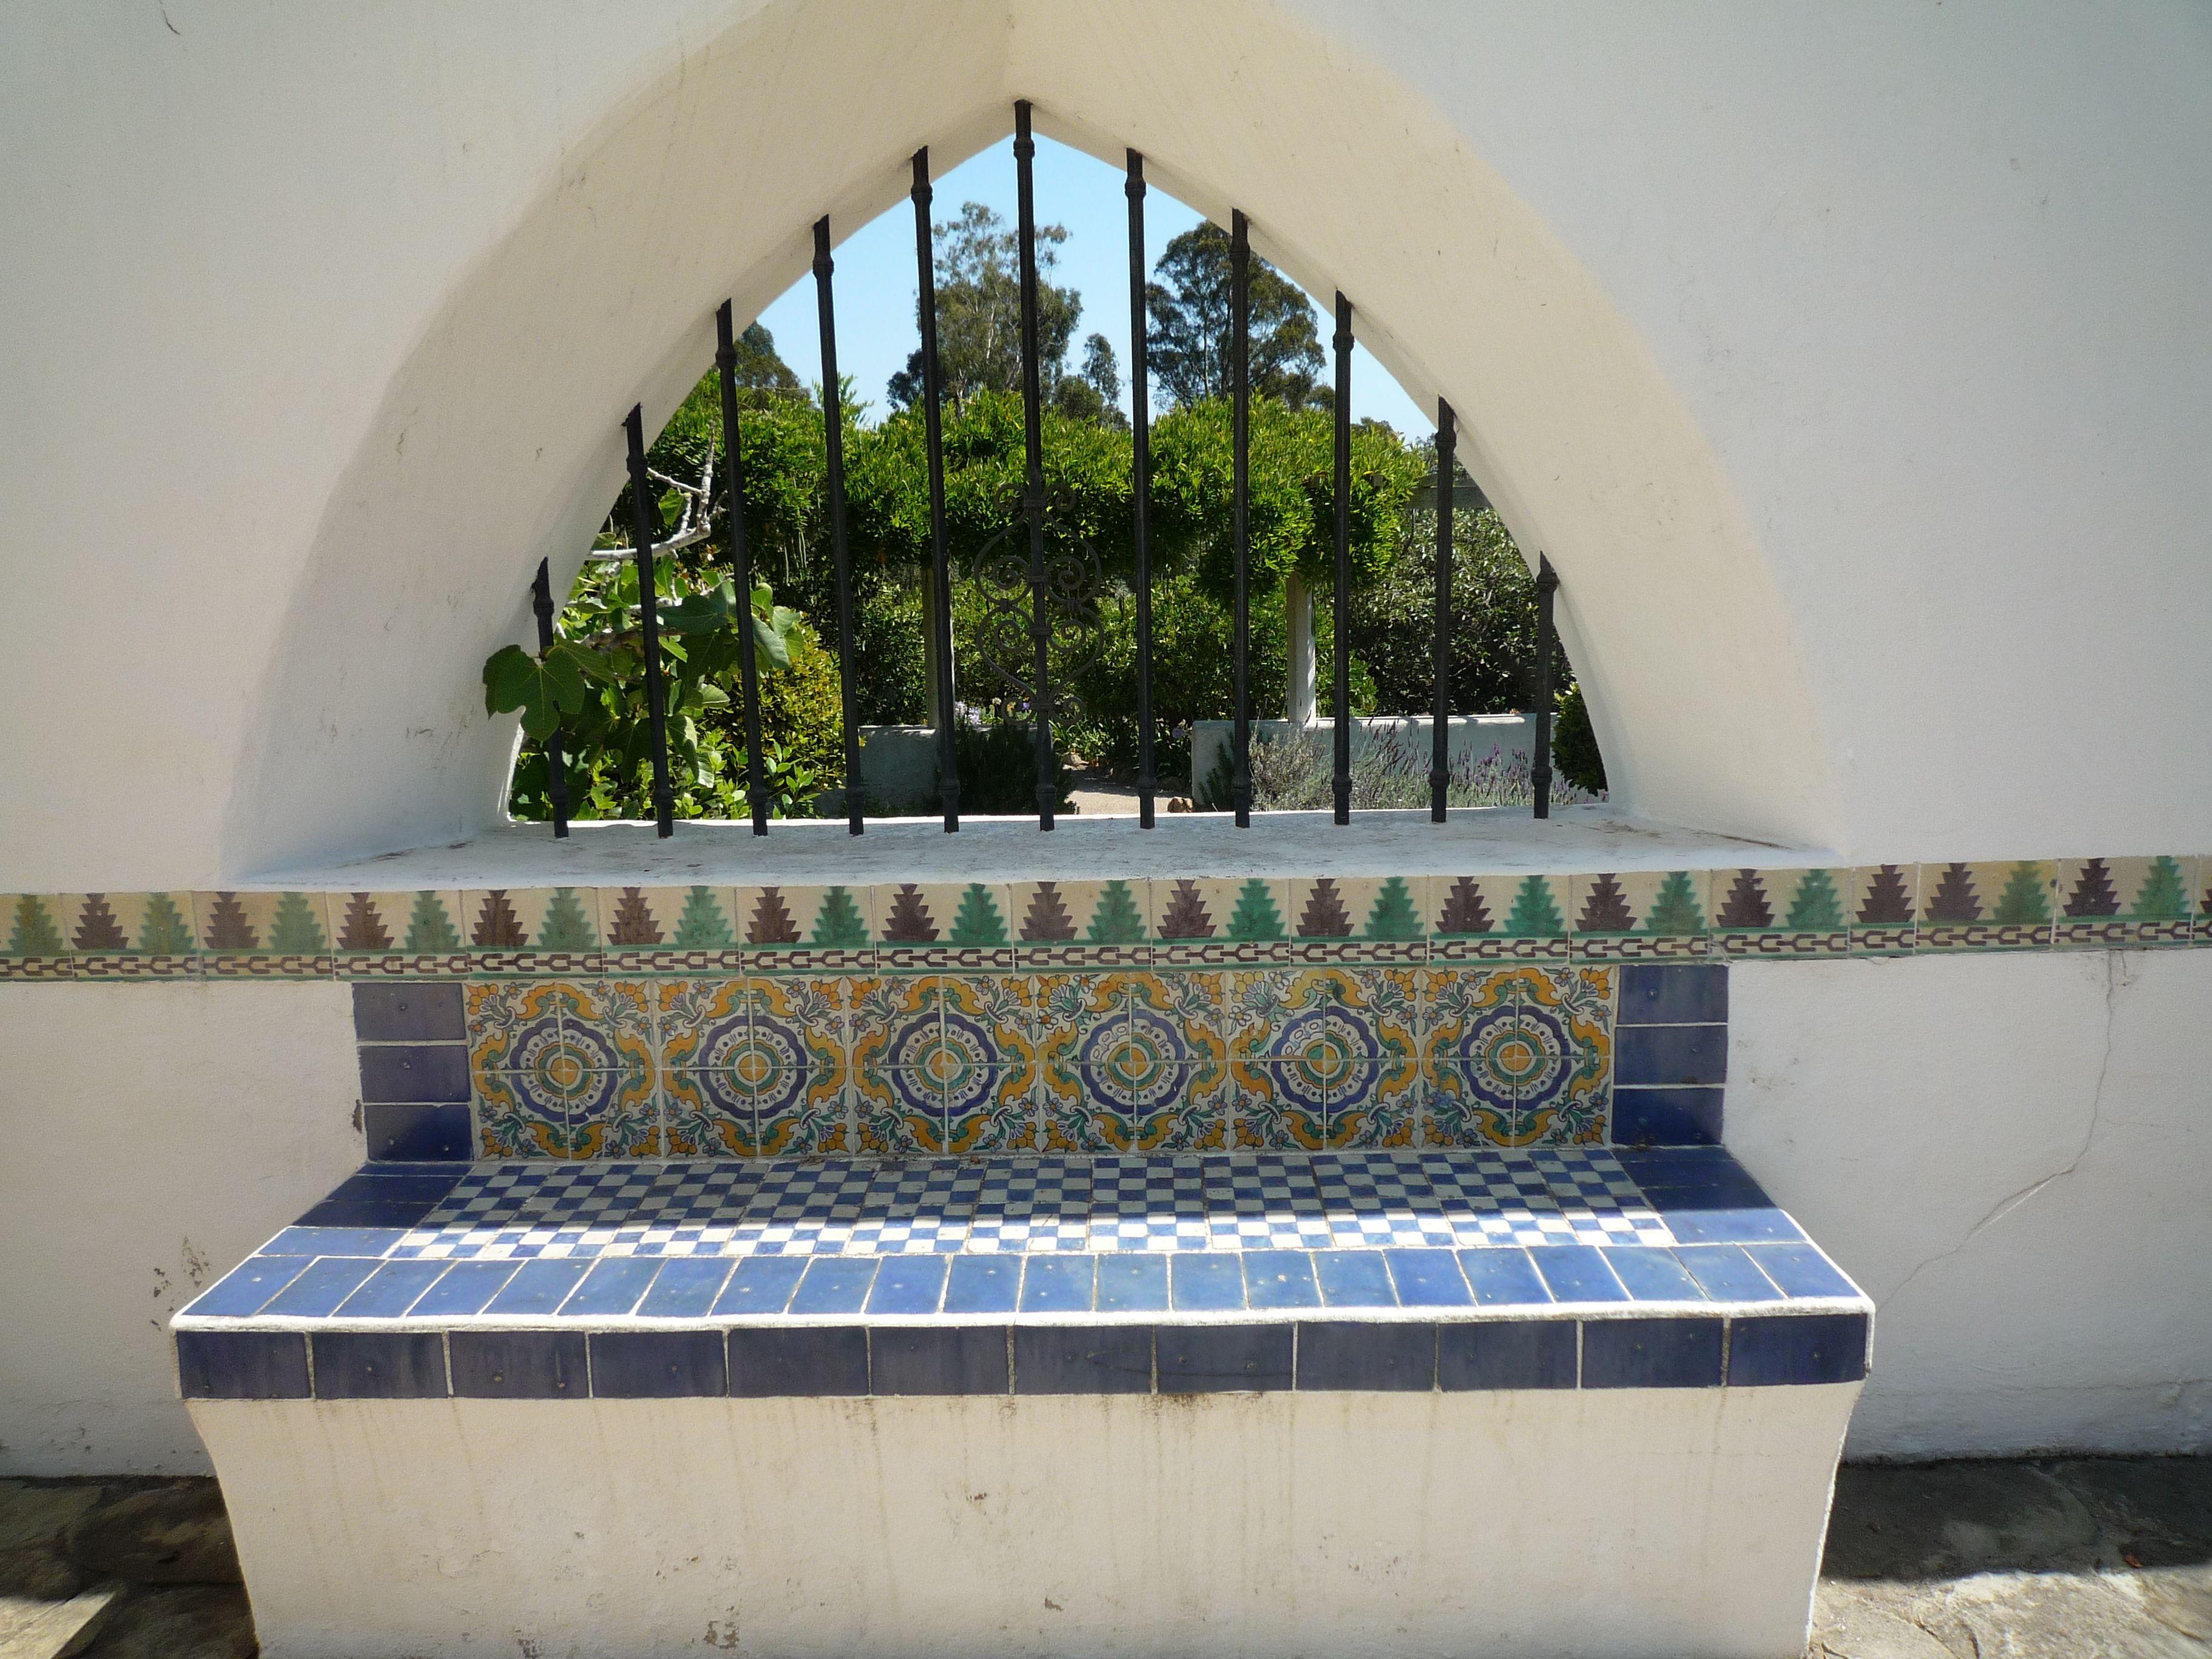 Marvelous Outdoor Bench At Casa Del Herrerro Santa Barbara Califoria Uwap Interior Chair Design Uwaporg